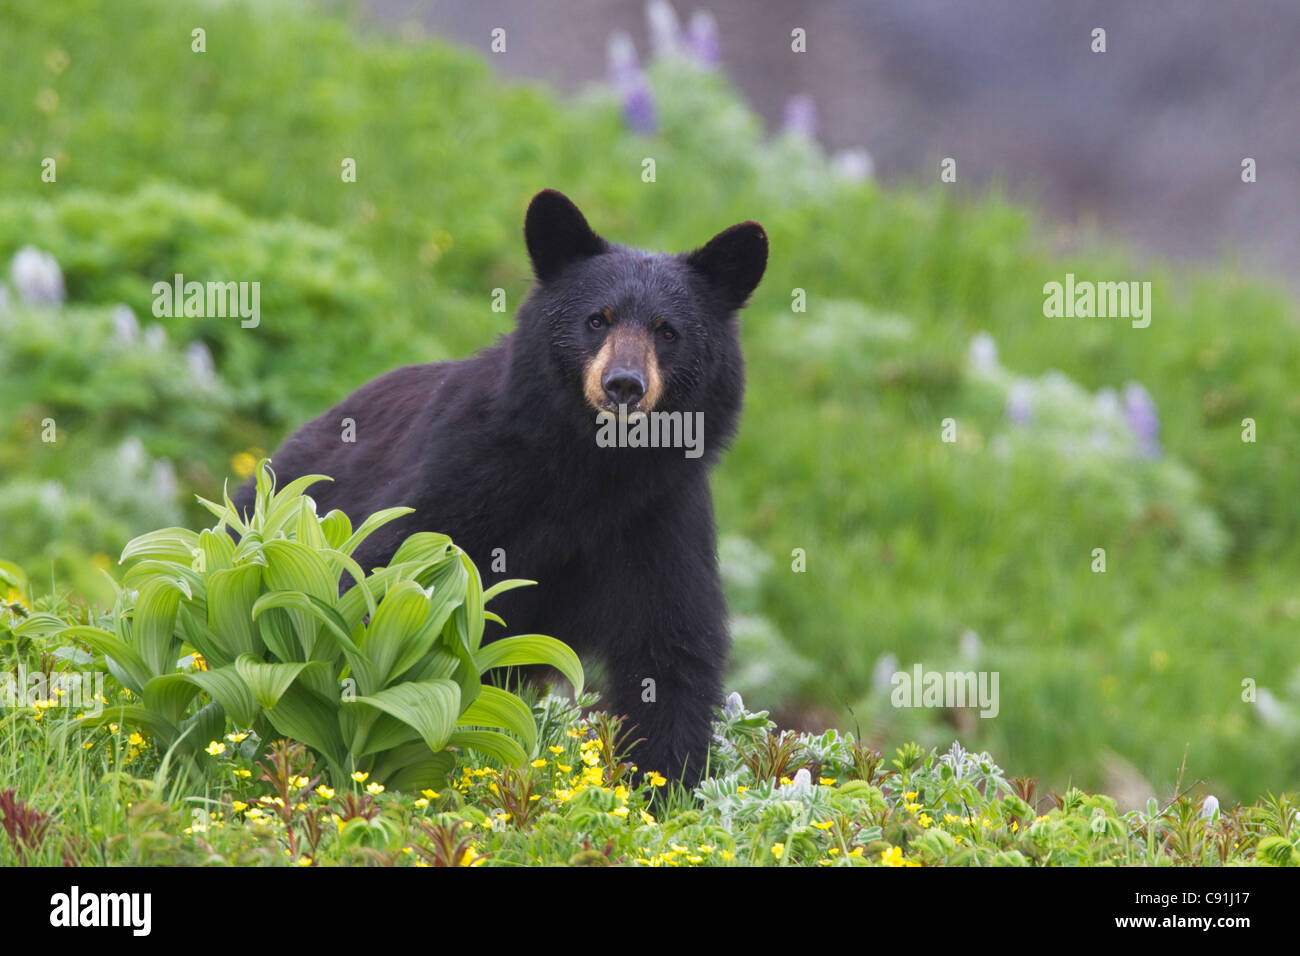 Black bear standing in alpine vegetation, Harding Icefield Trail, Kenai Fjords National Park, near Seward, Southcentral - Stock Image